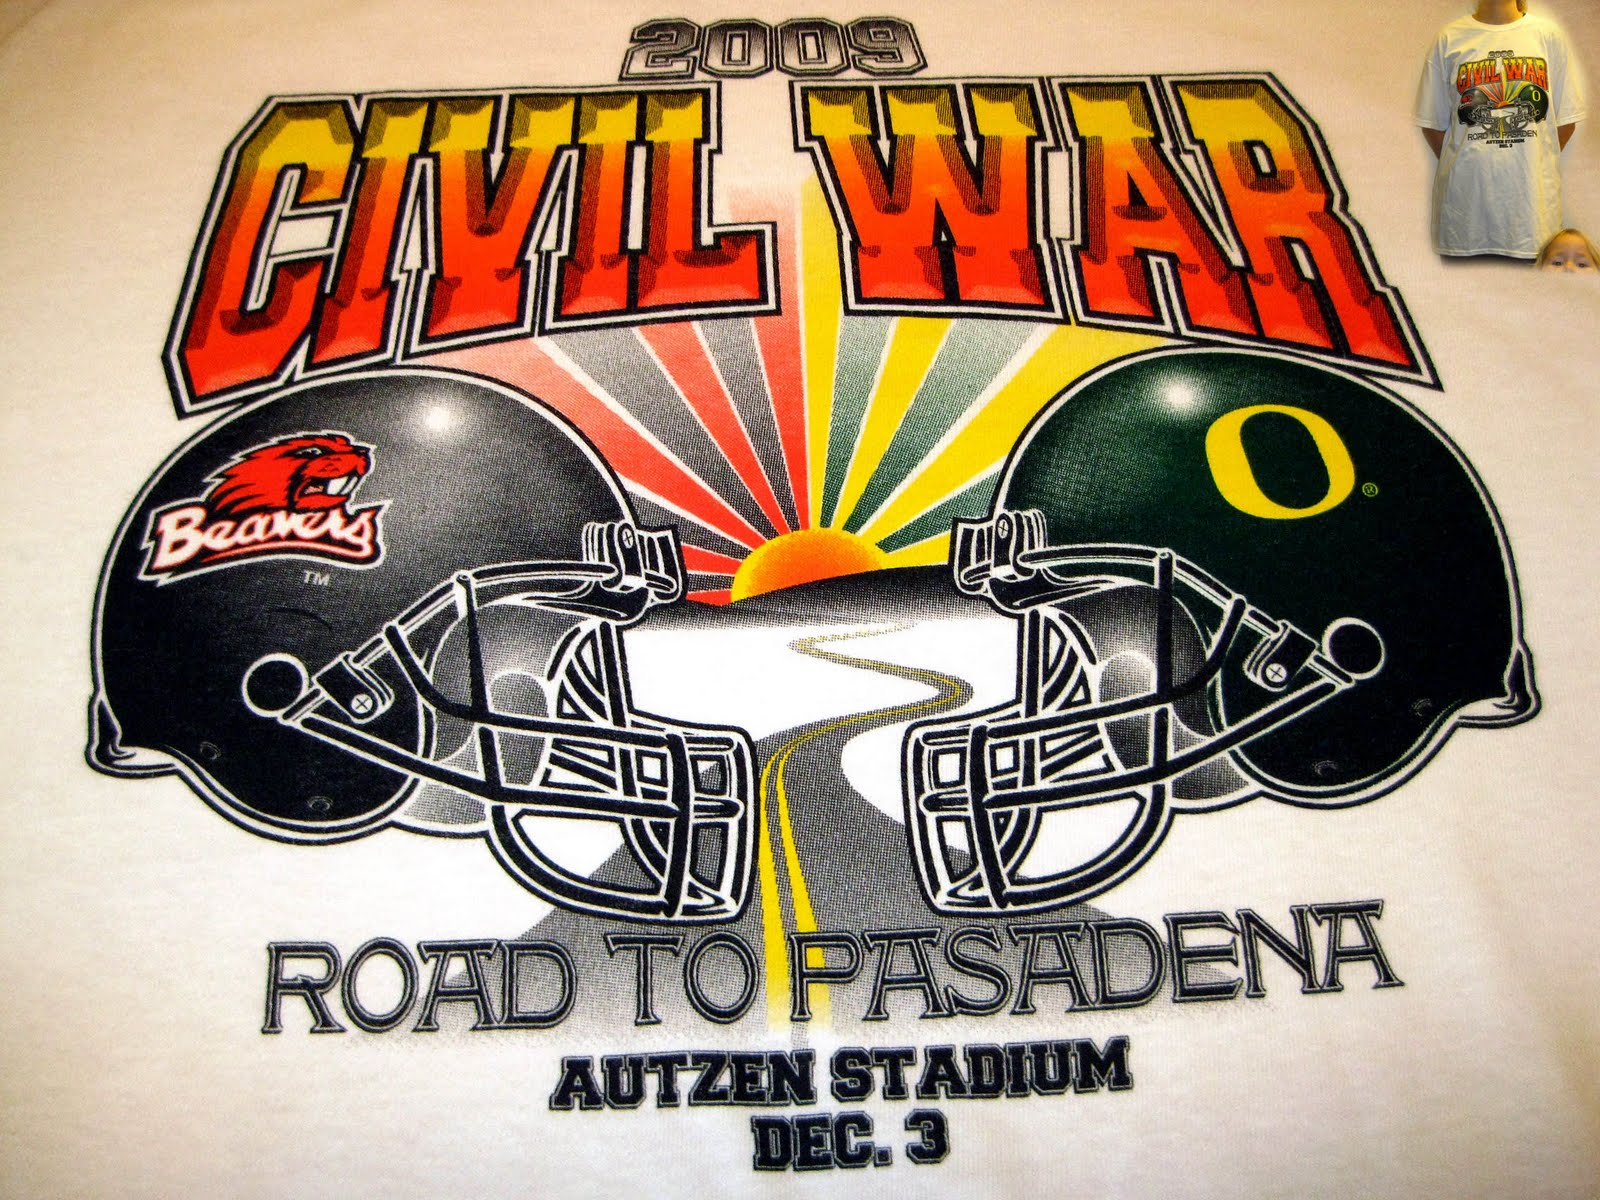 https://i1.wp.com/4.bp.blogspot.com/_DOF4LiEatkg/Swtr7QaZ8LI/AAAAAAAAAQk/tLq3OpB9BVI/s1600/ducks-vs-beavers-civil-war-.jpg